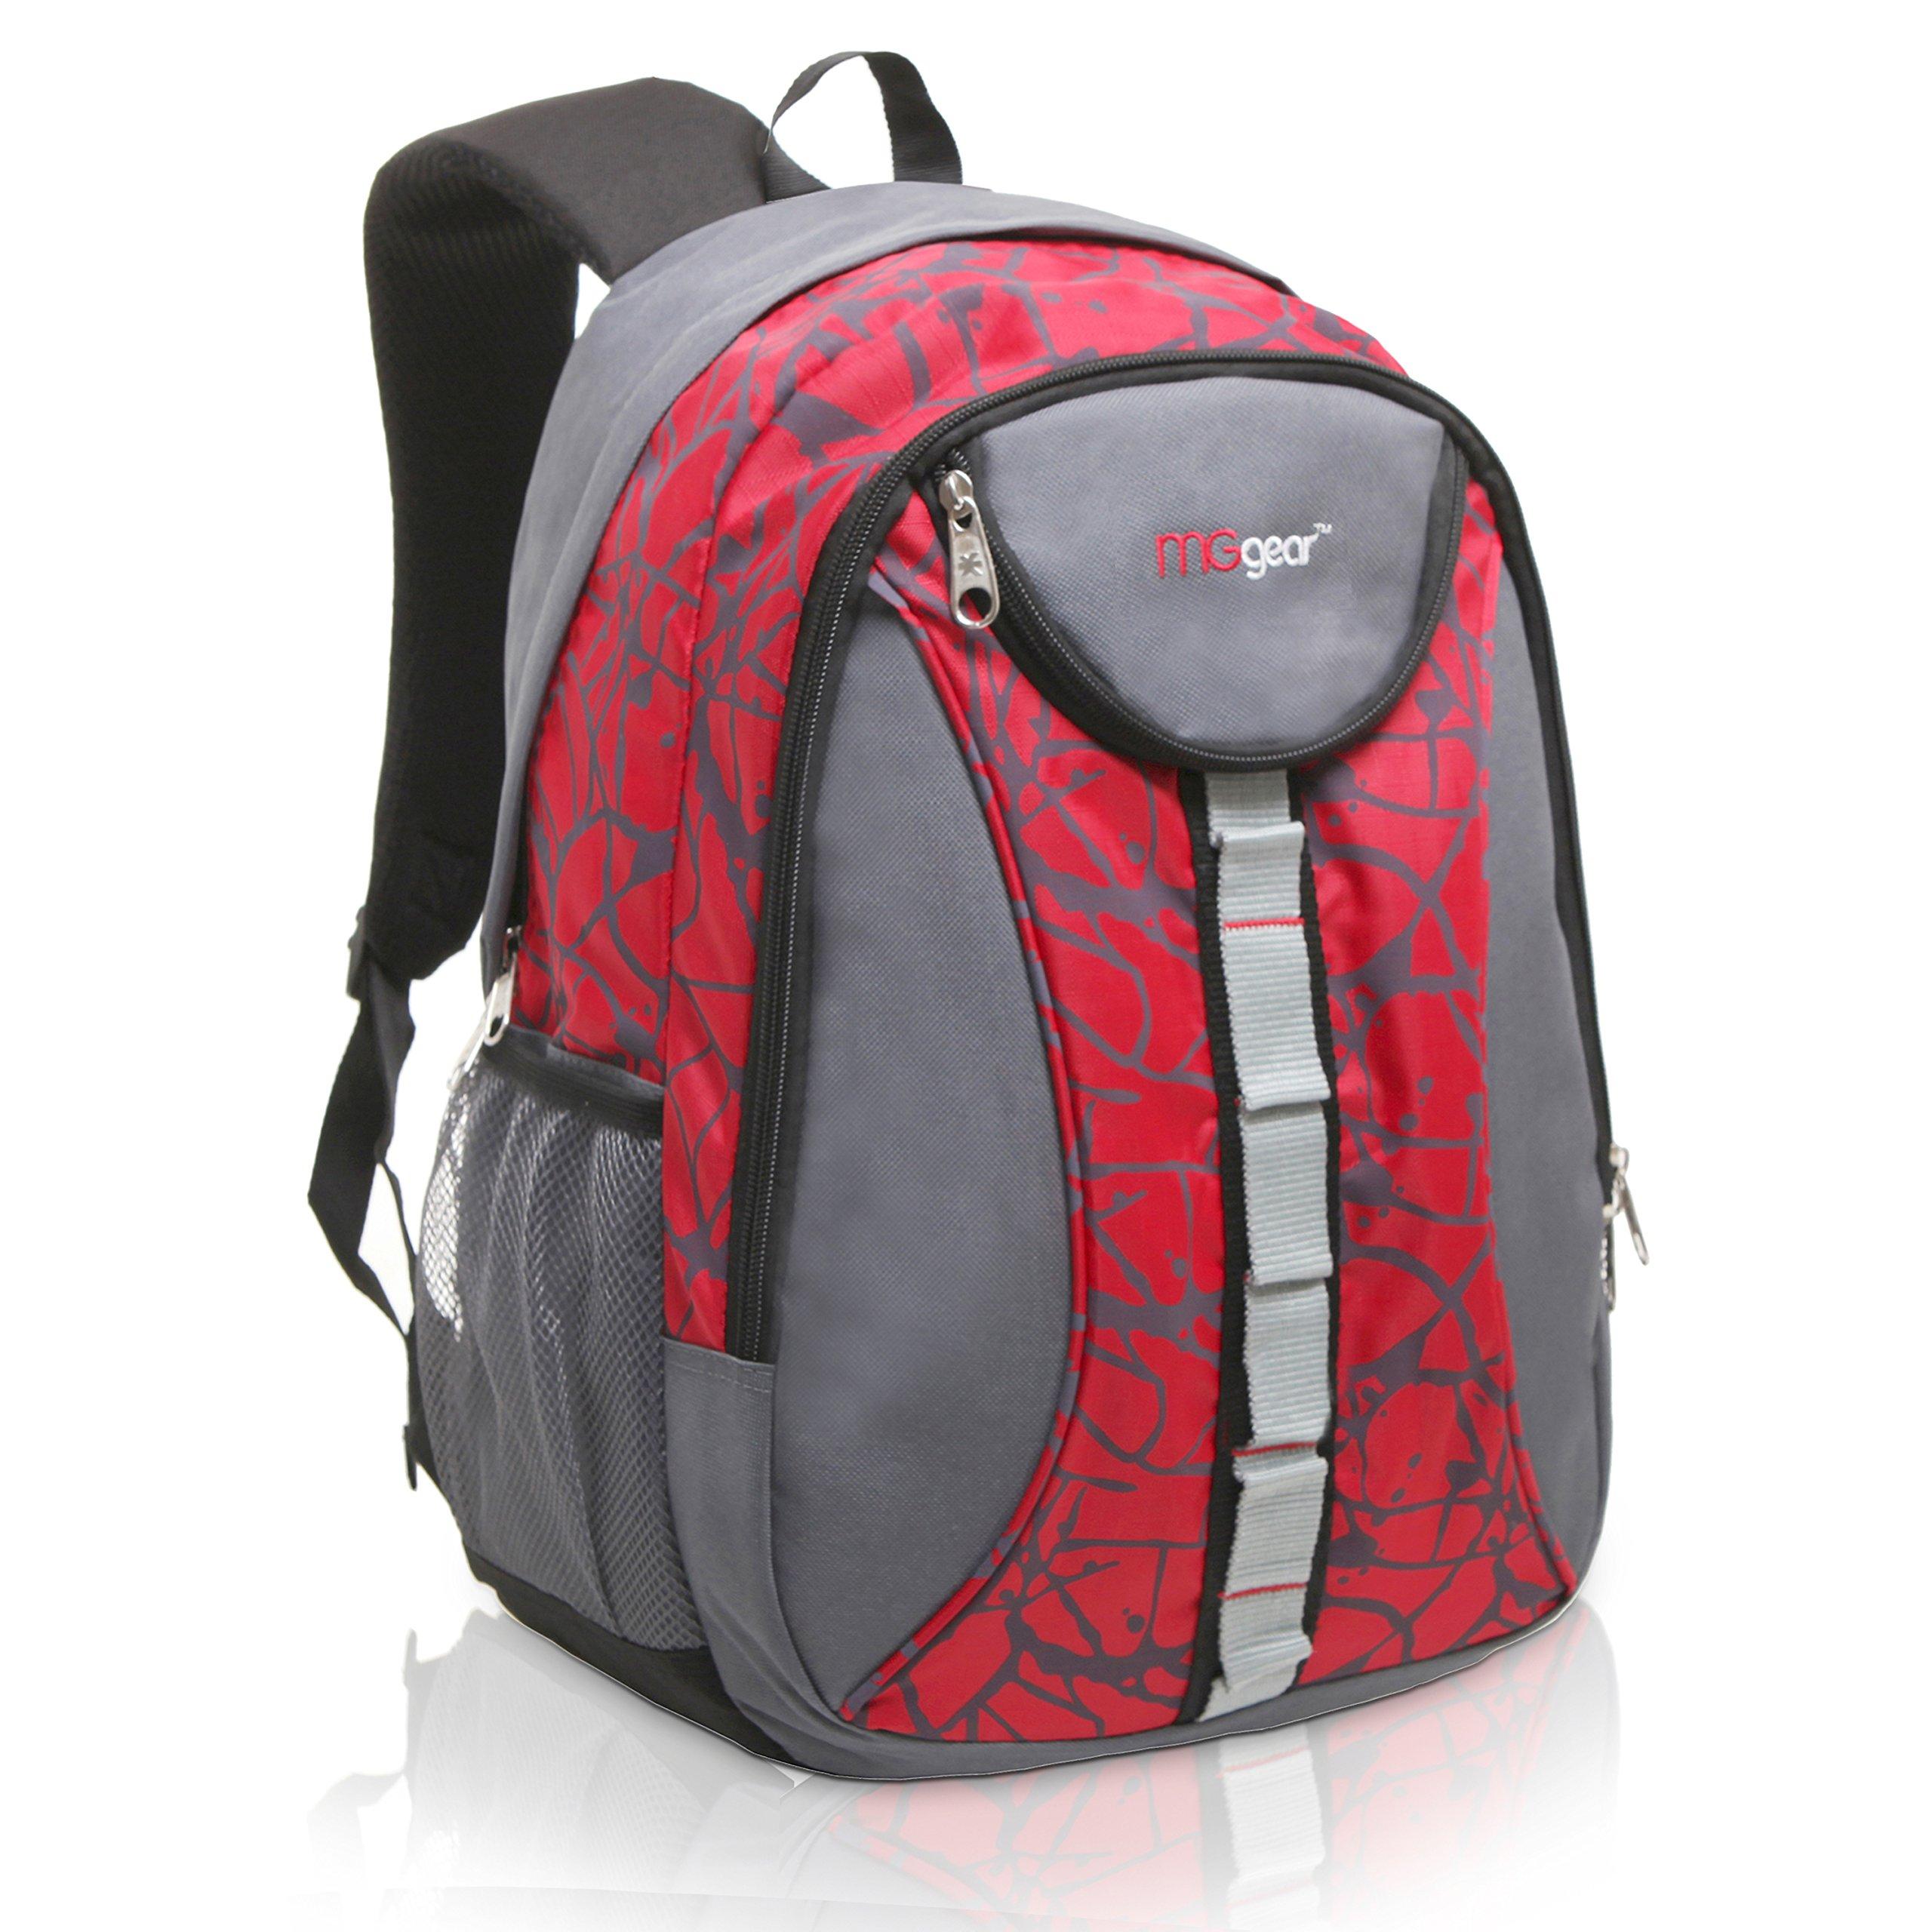 Wholesale 18 Inch Heavy Duty Student School Backpack Bulk Case Of